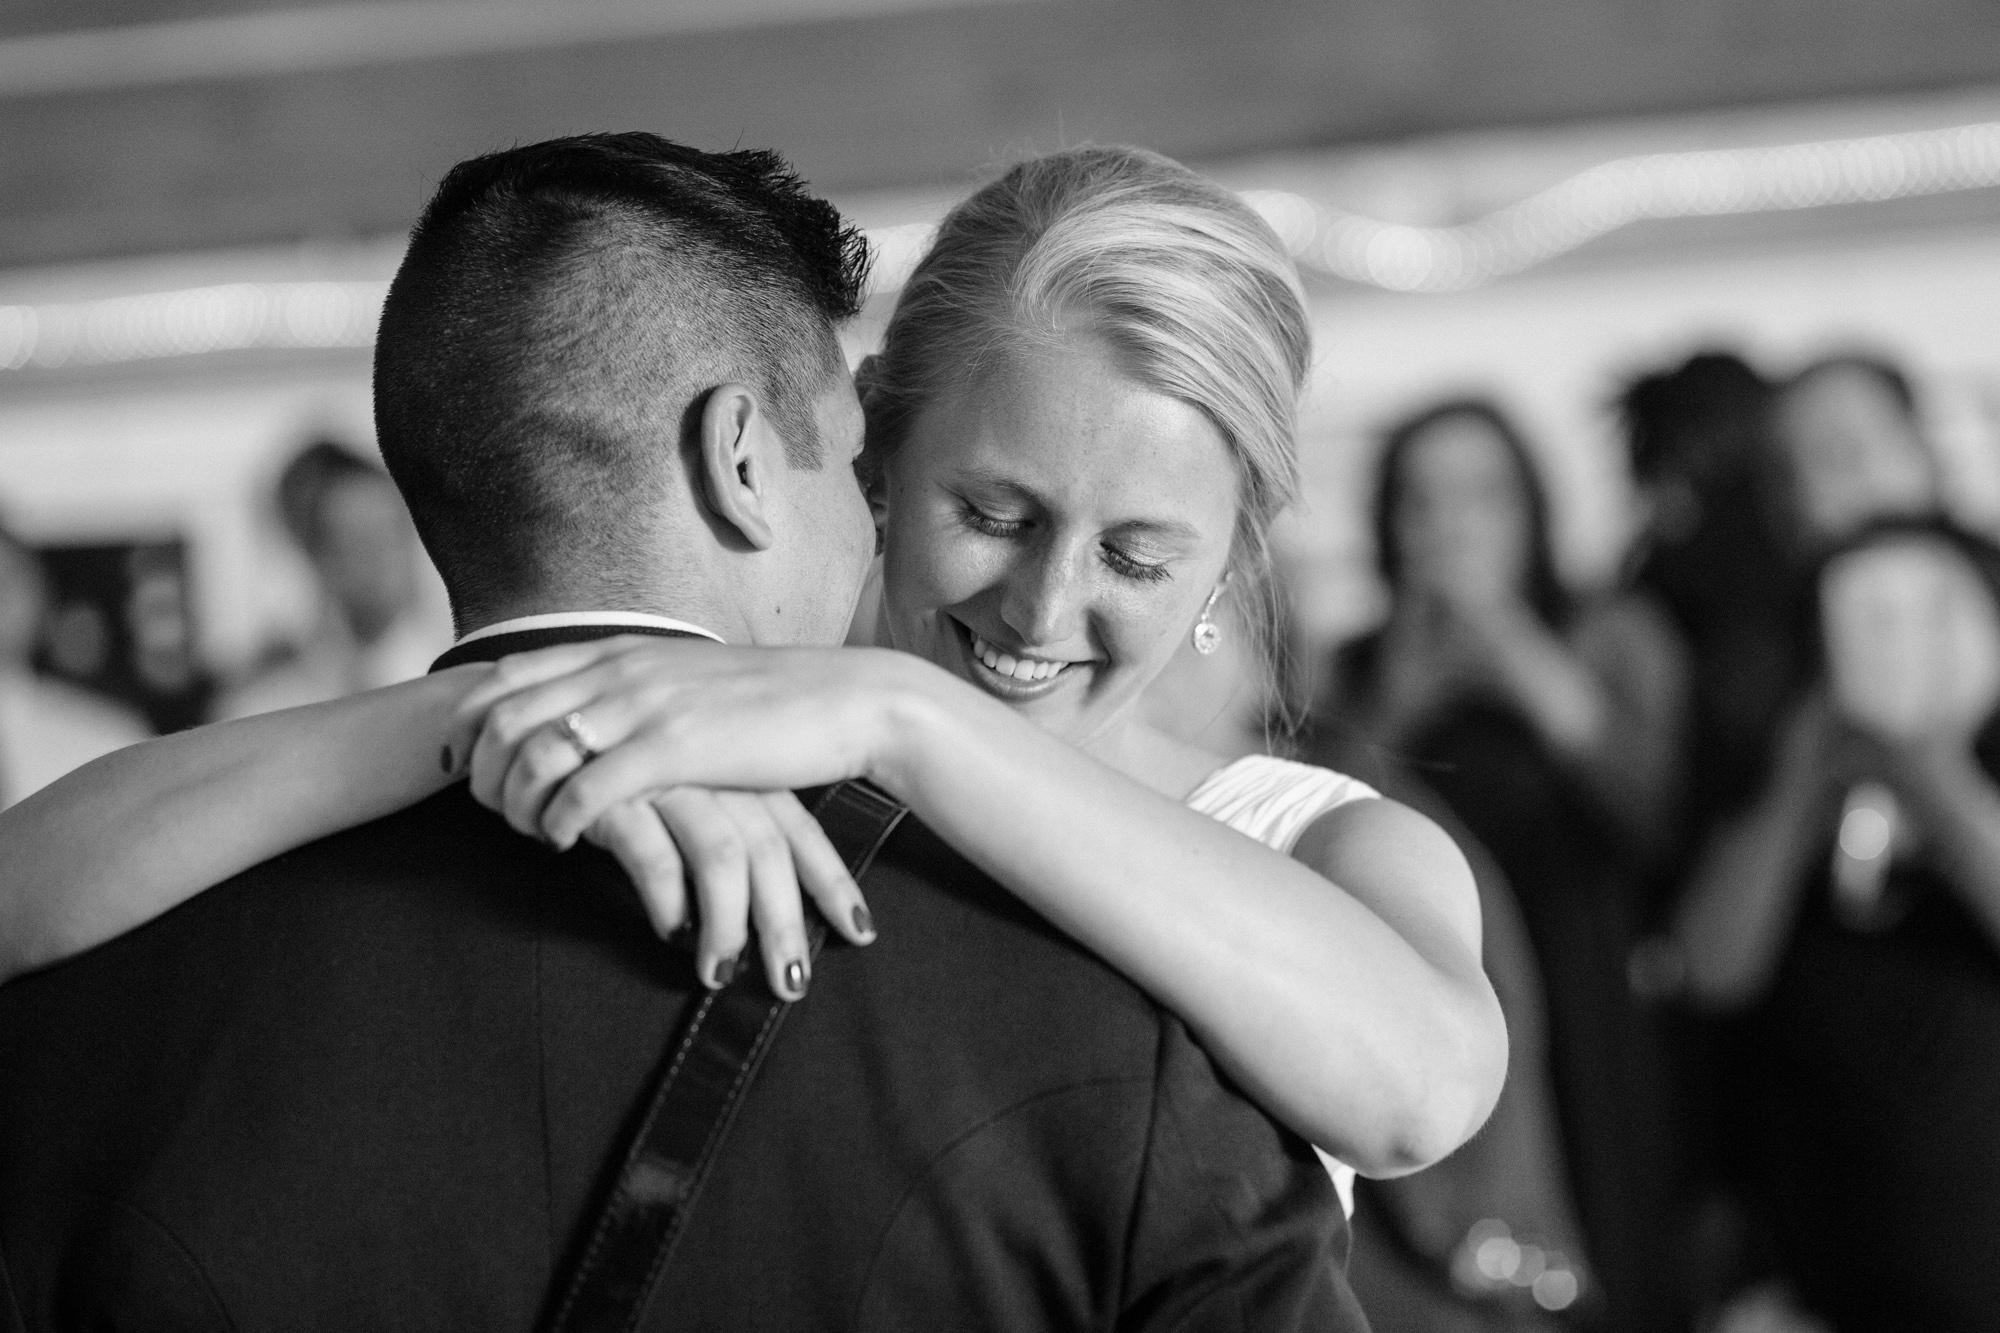 2017_05_27_ray_caroline_naval_wedding-6851-2.jpg